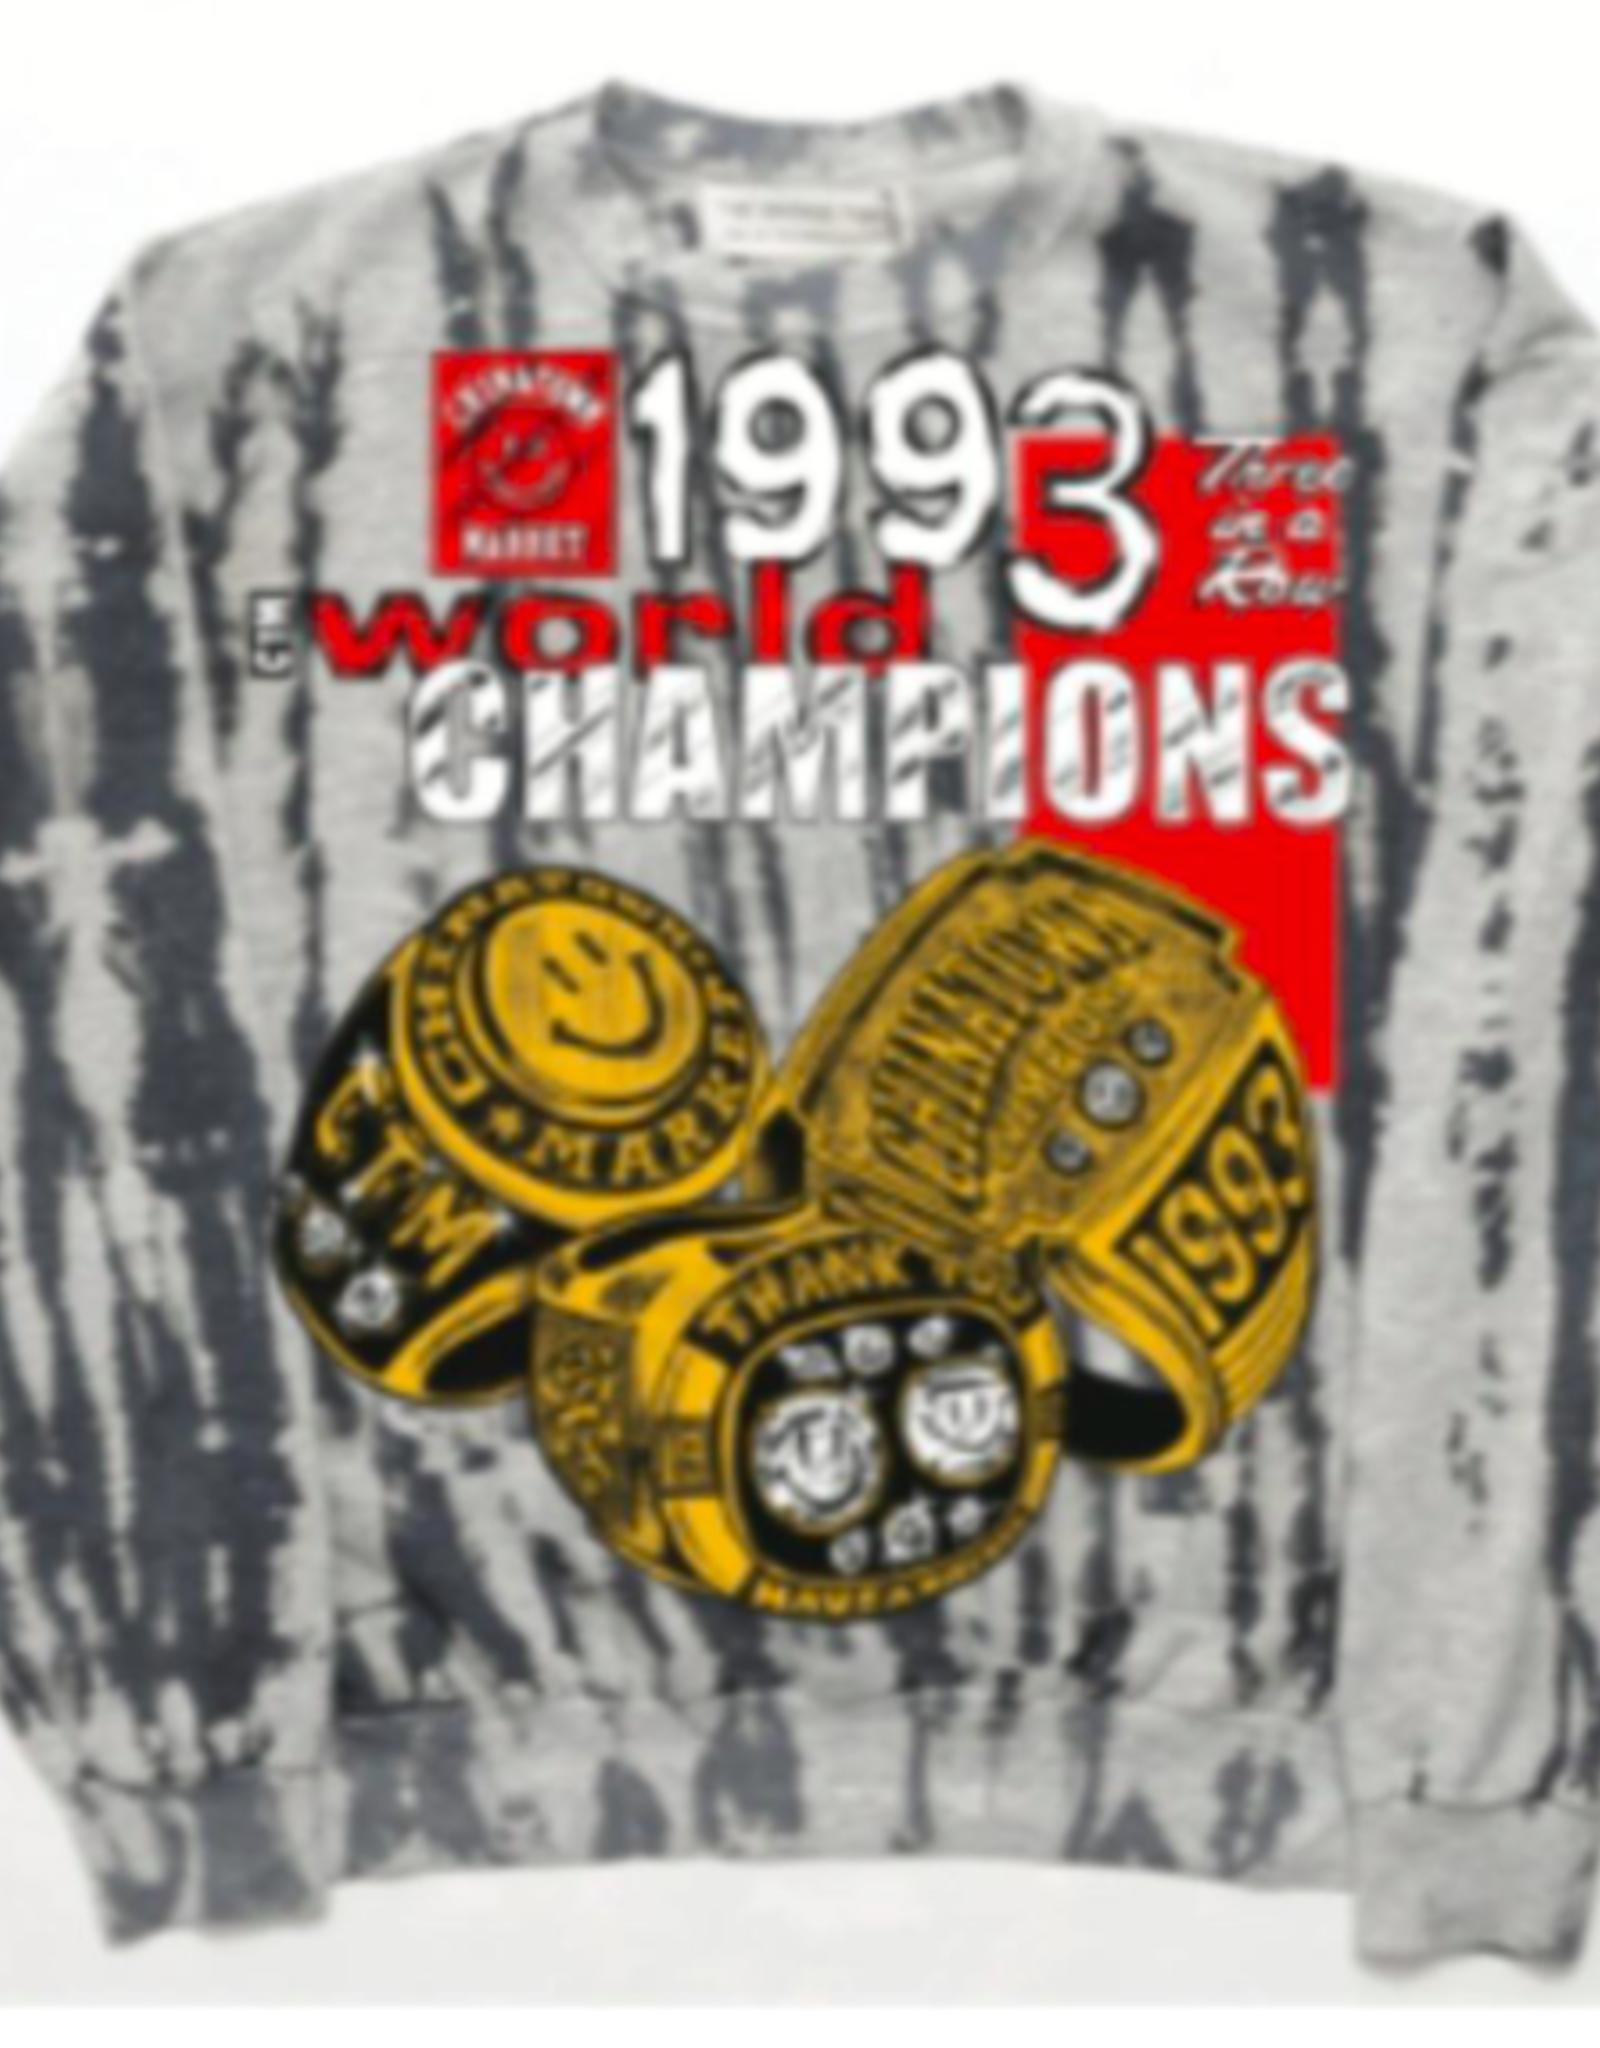 SMILEY CHAMPION 3 RINGS TIE-DYE SWEATSHORTS